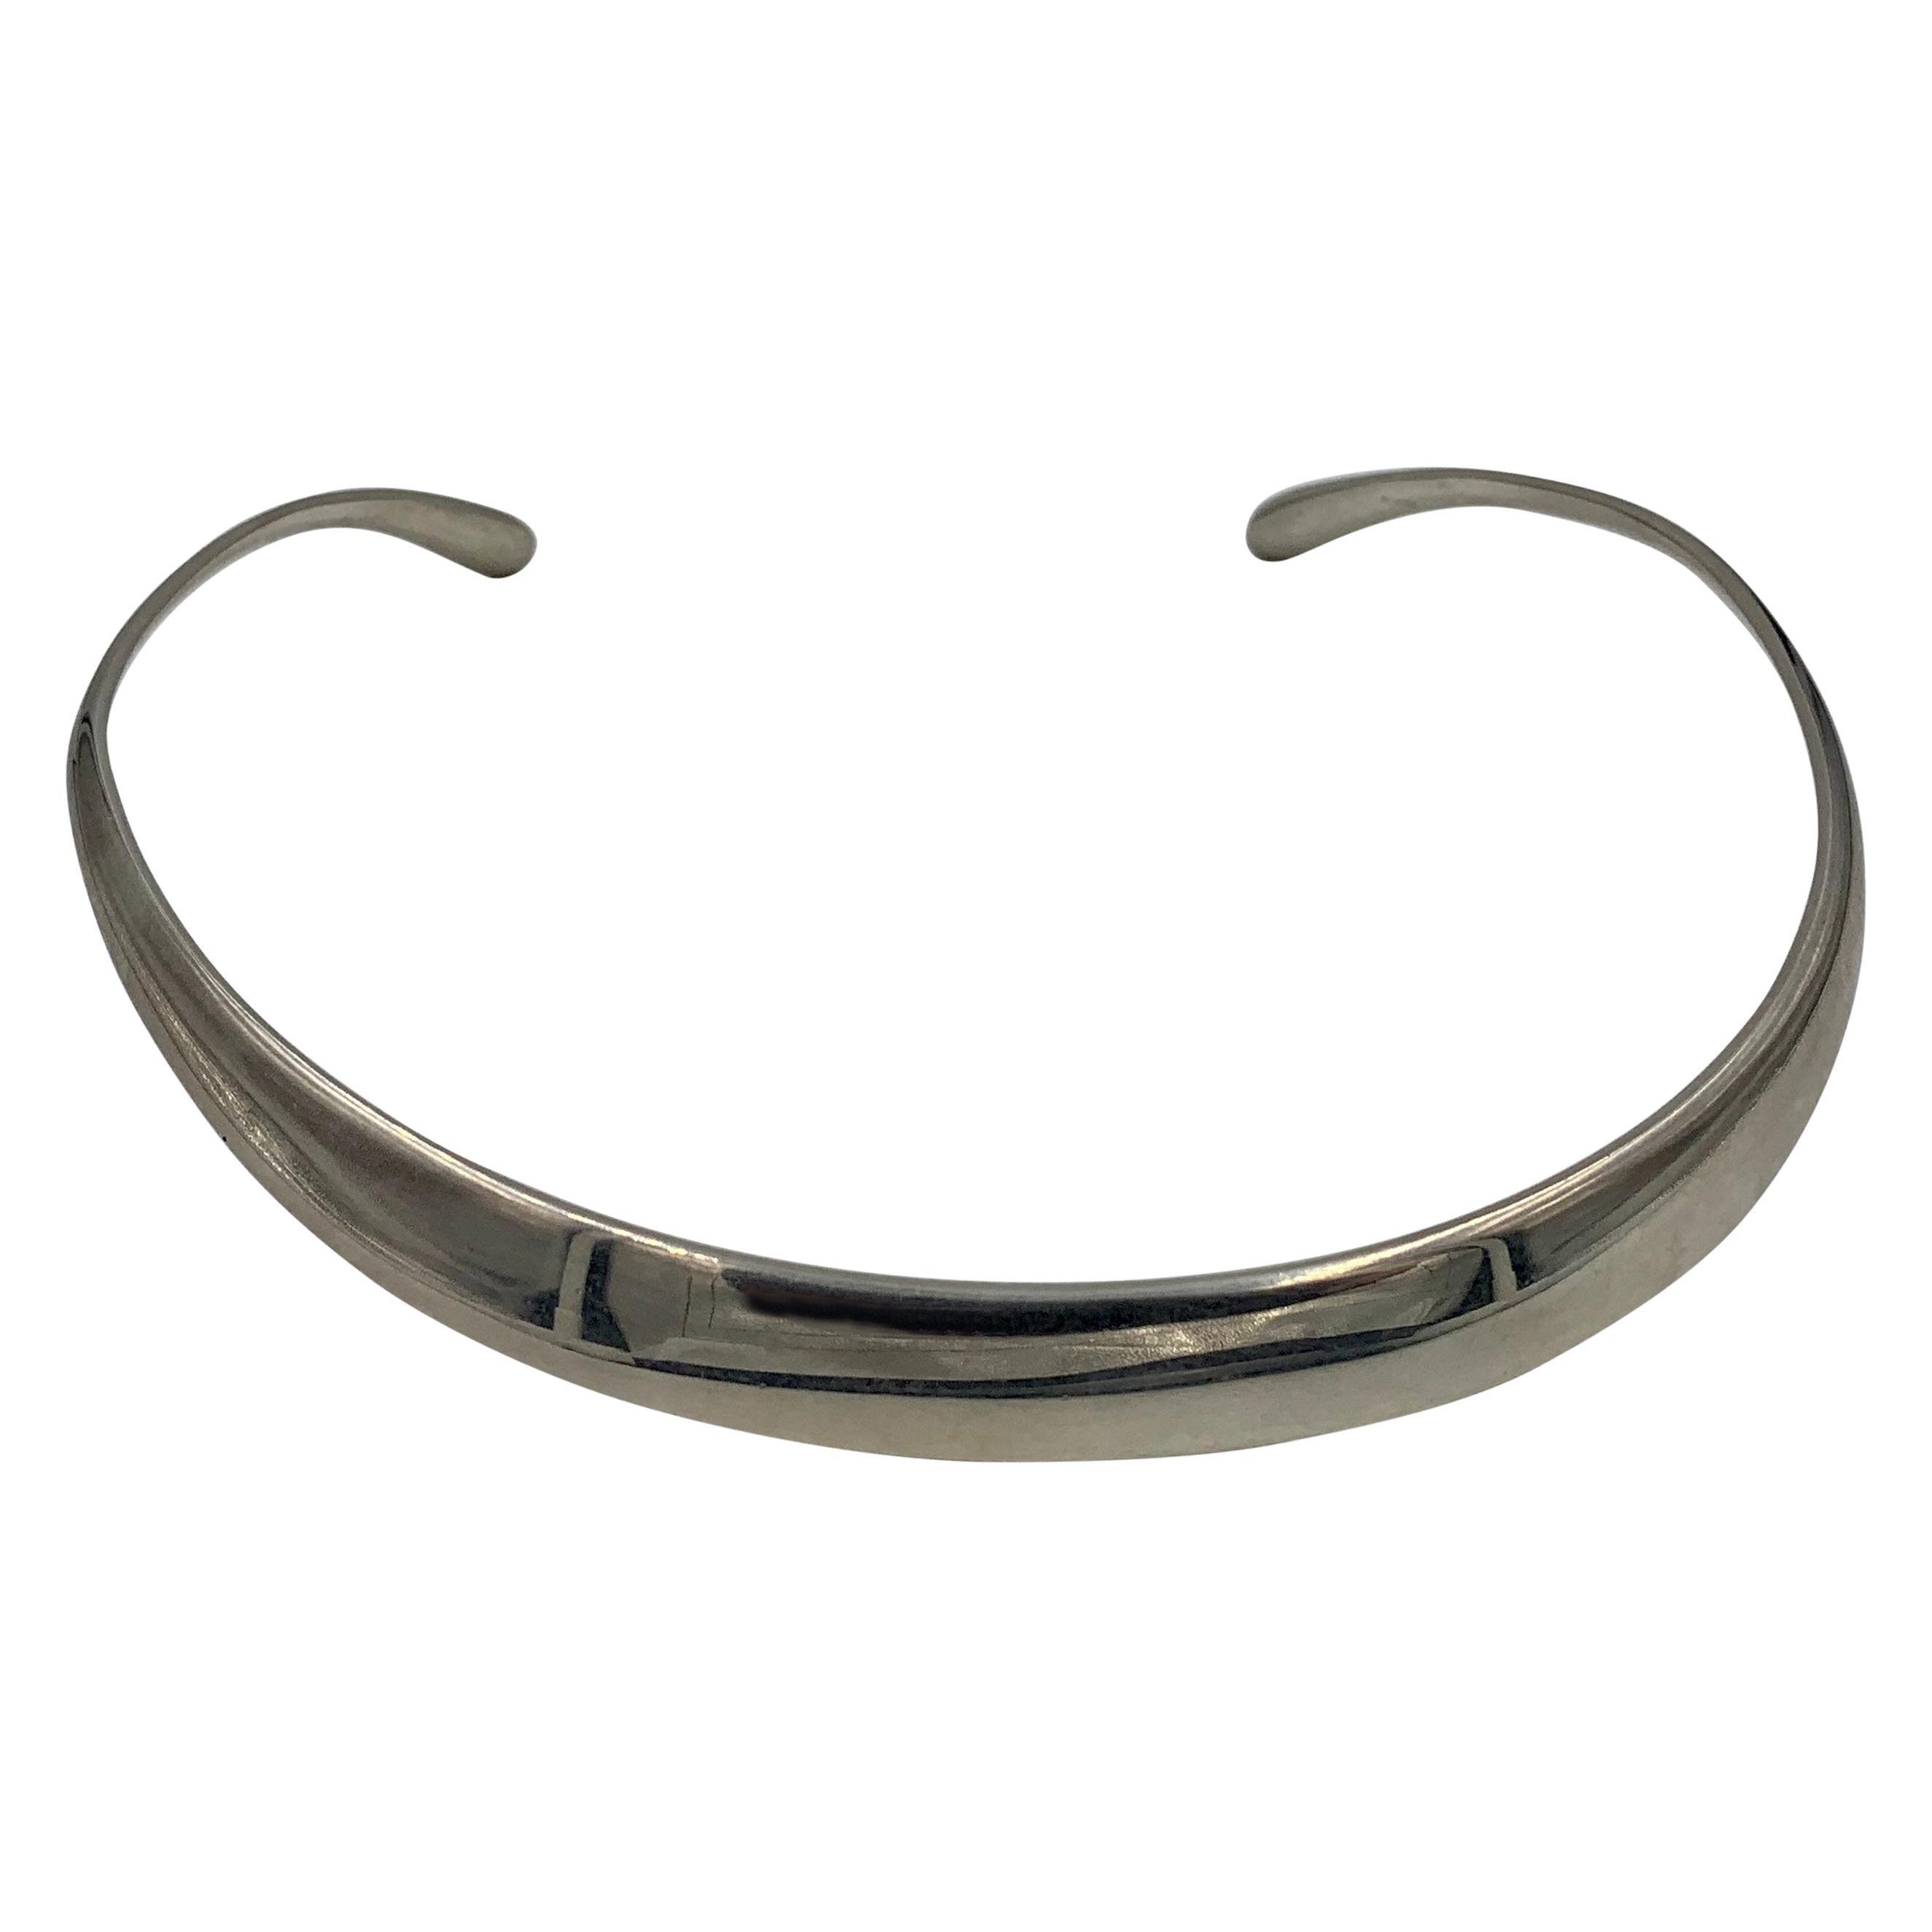 David Andersen Norway Modernist Collar Necklace Sterling Silver Midcentury